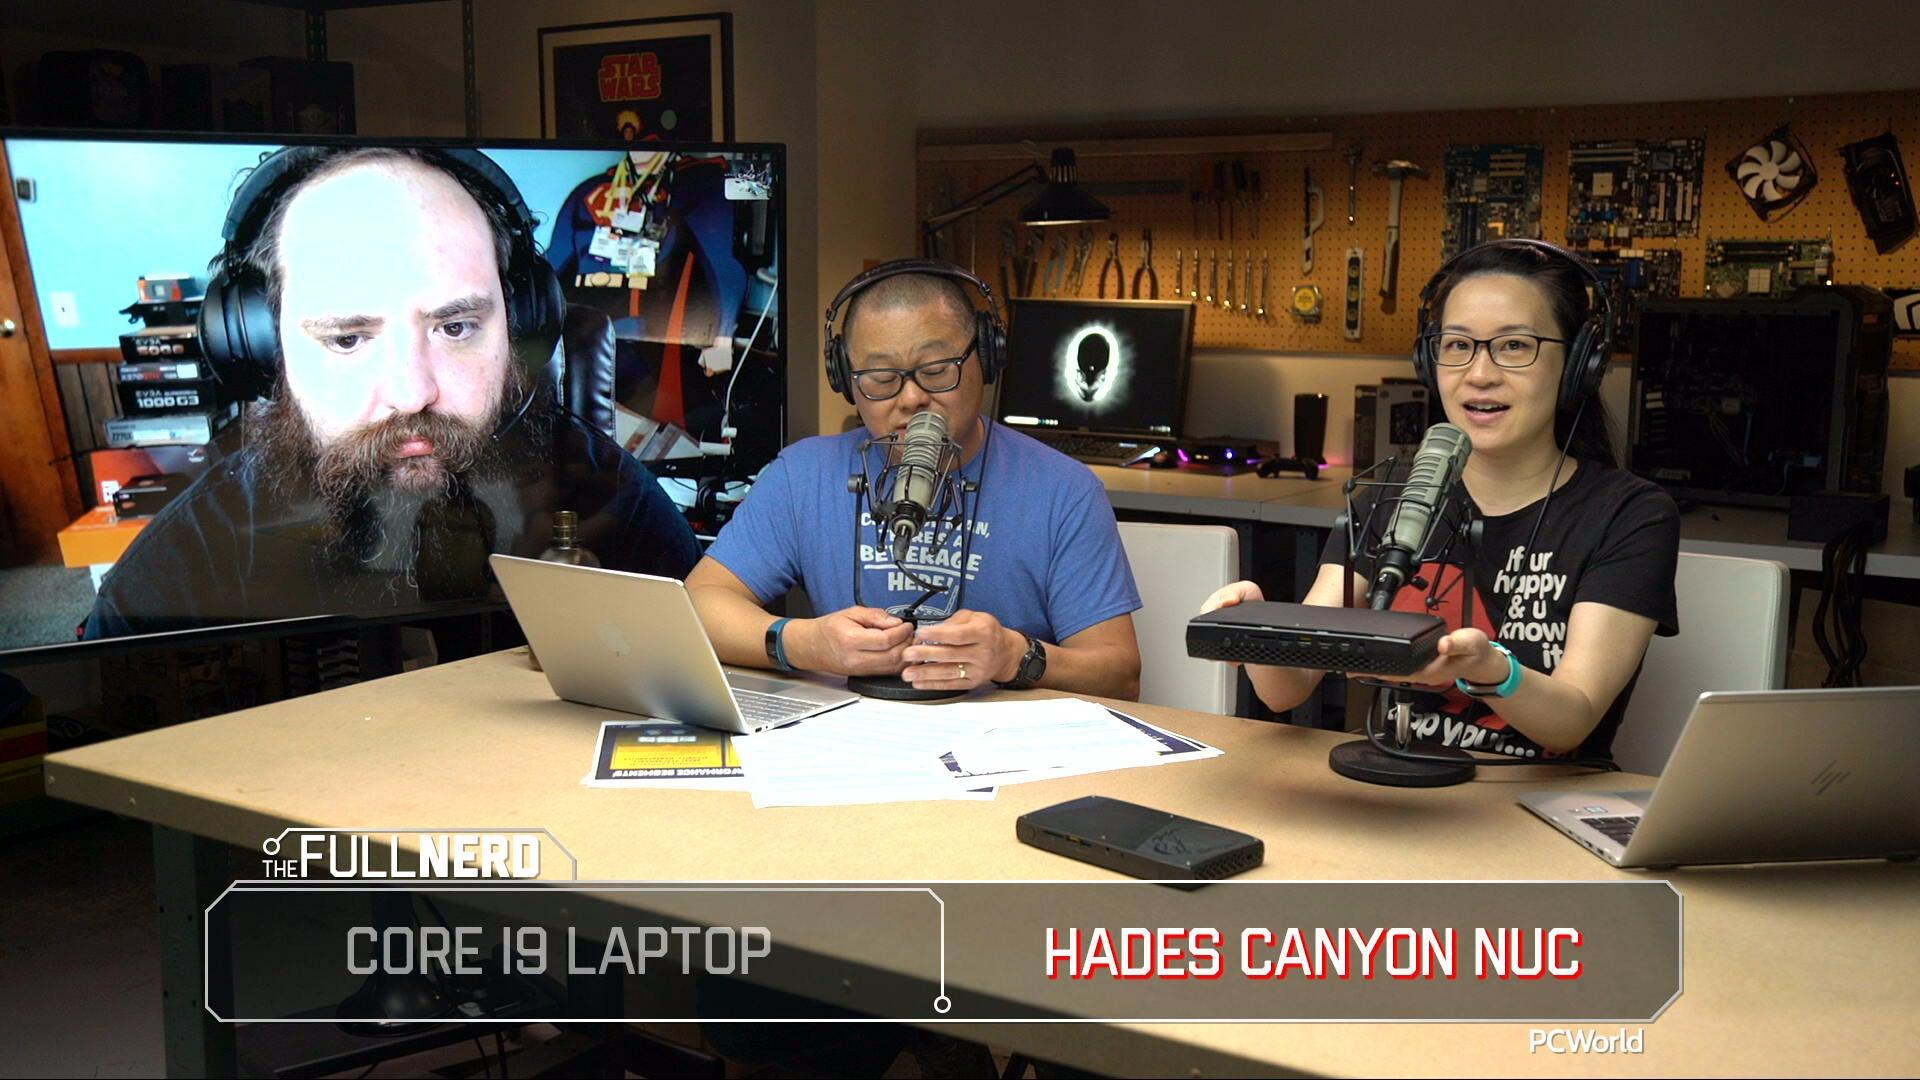 Intel Hades Canyon NUC (NUC8i7HVK) review   PCWorld